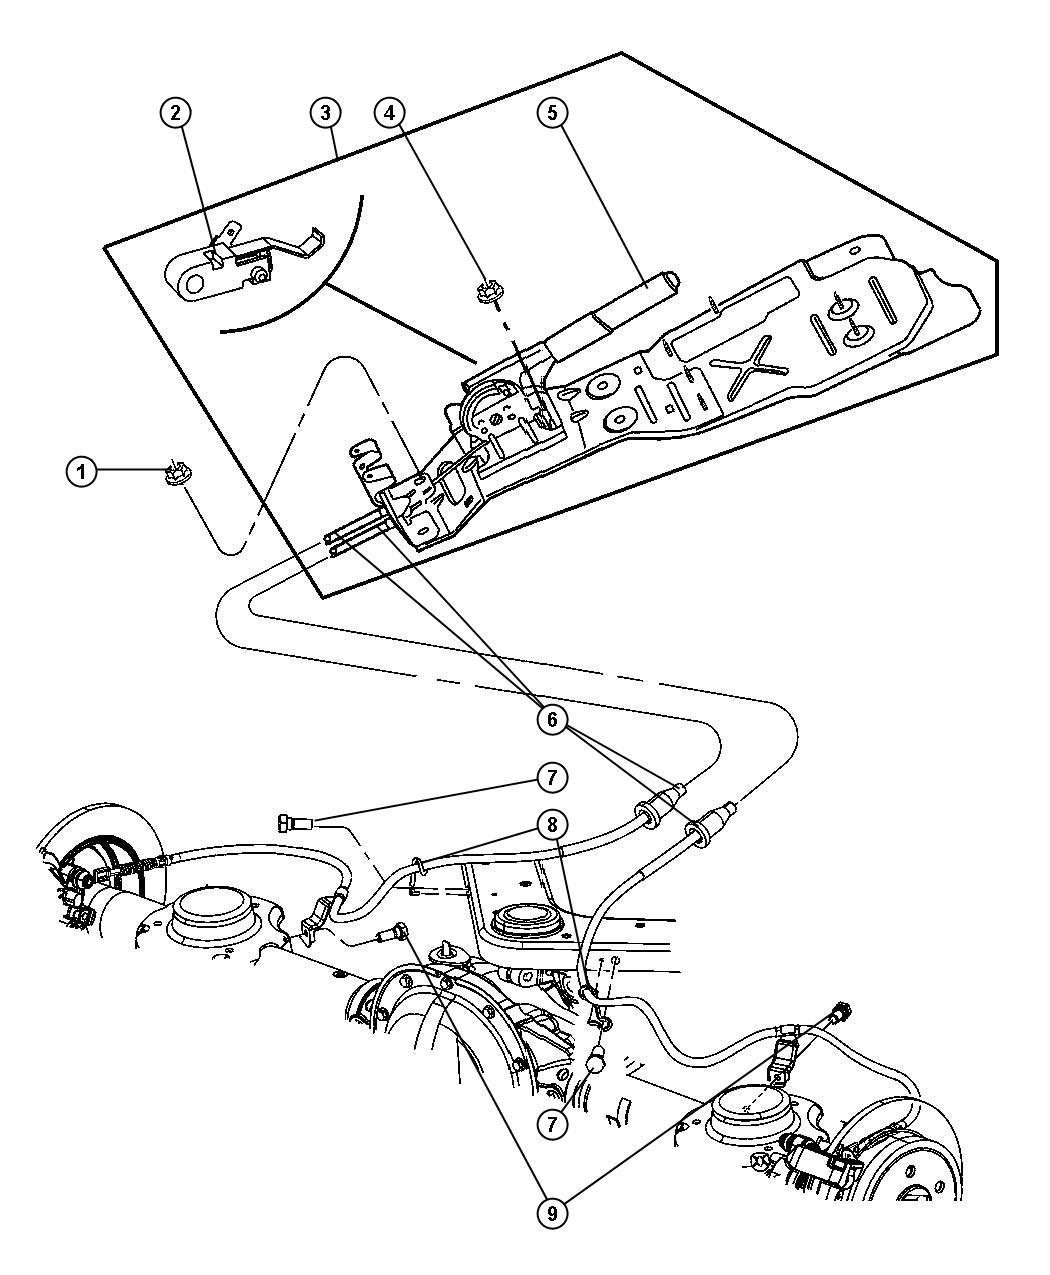 Service Manual Jeep Liberty Parking Brake Repair